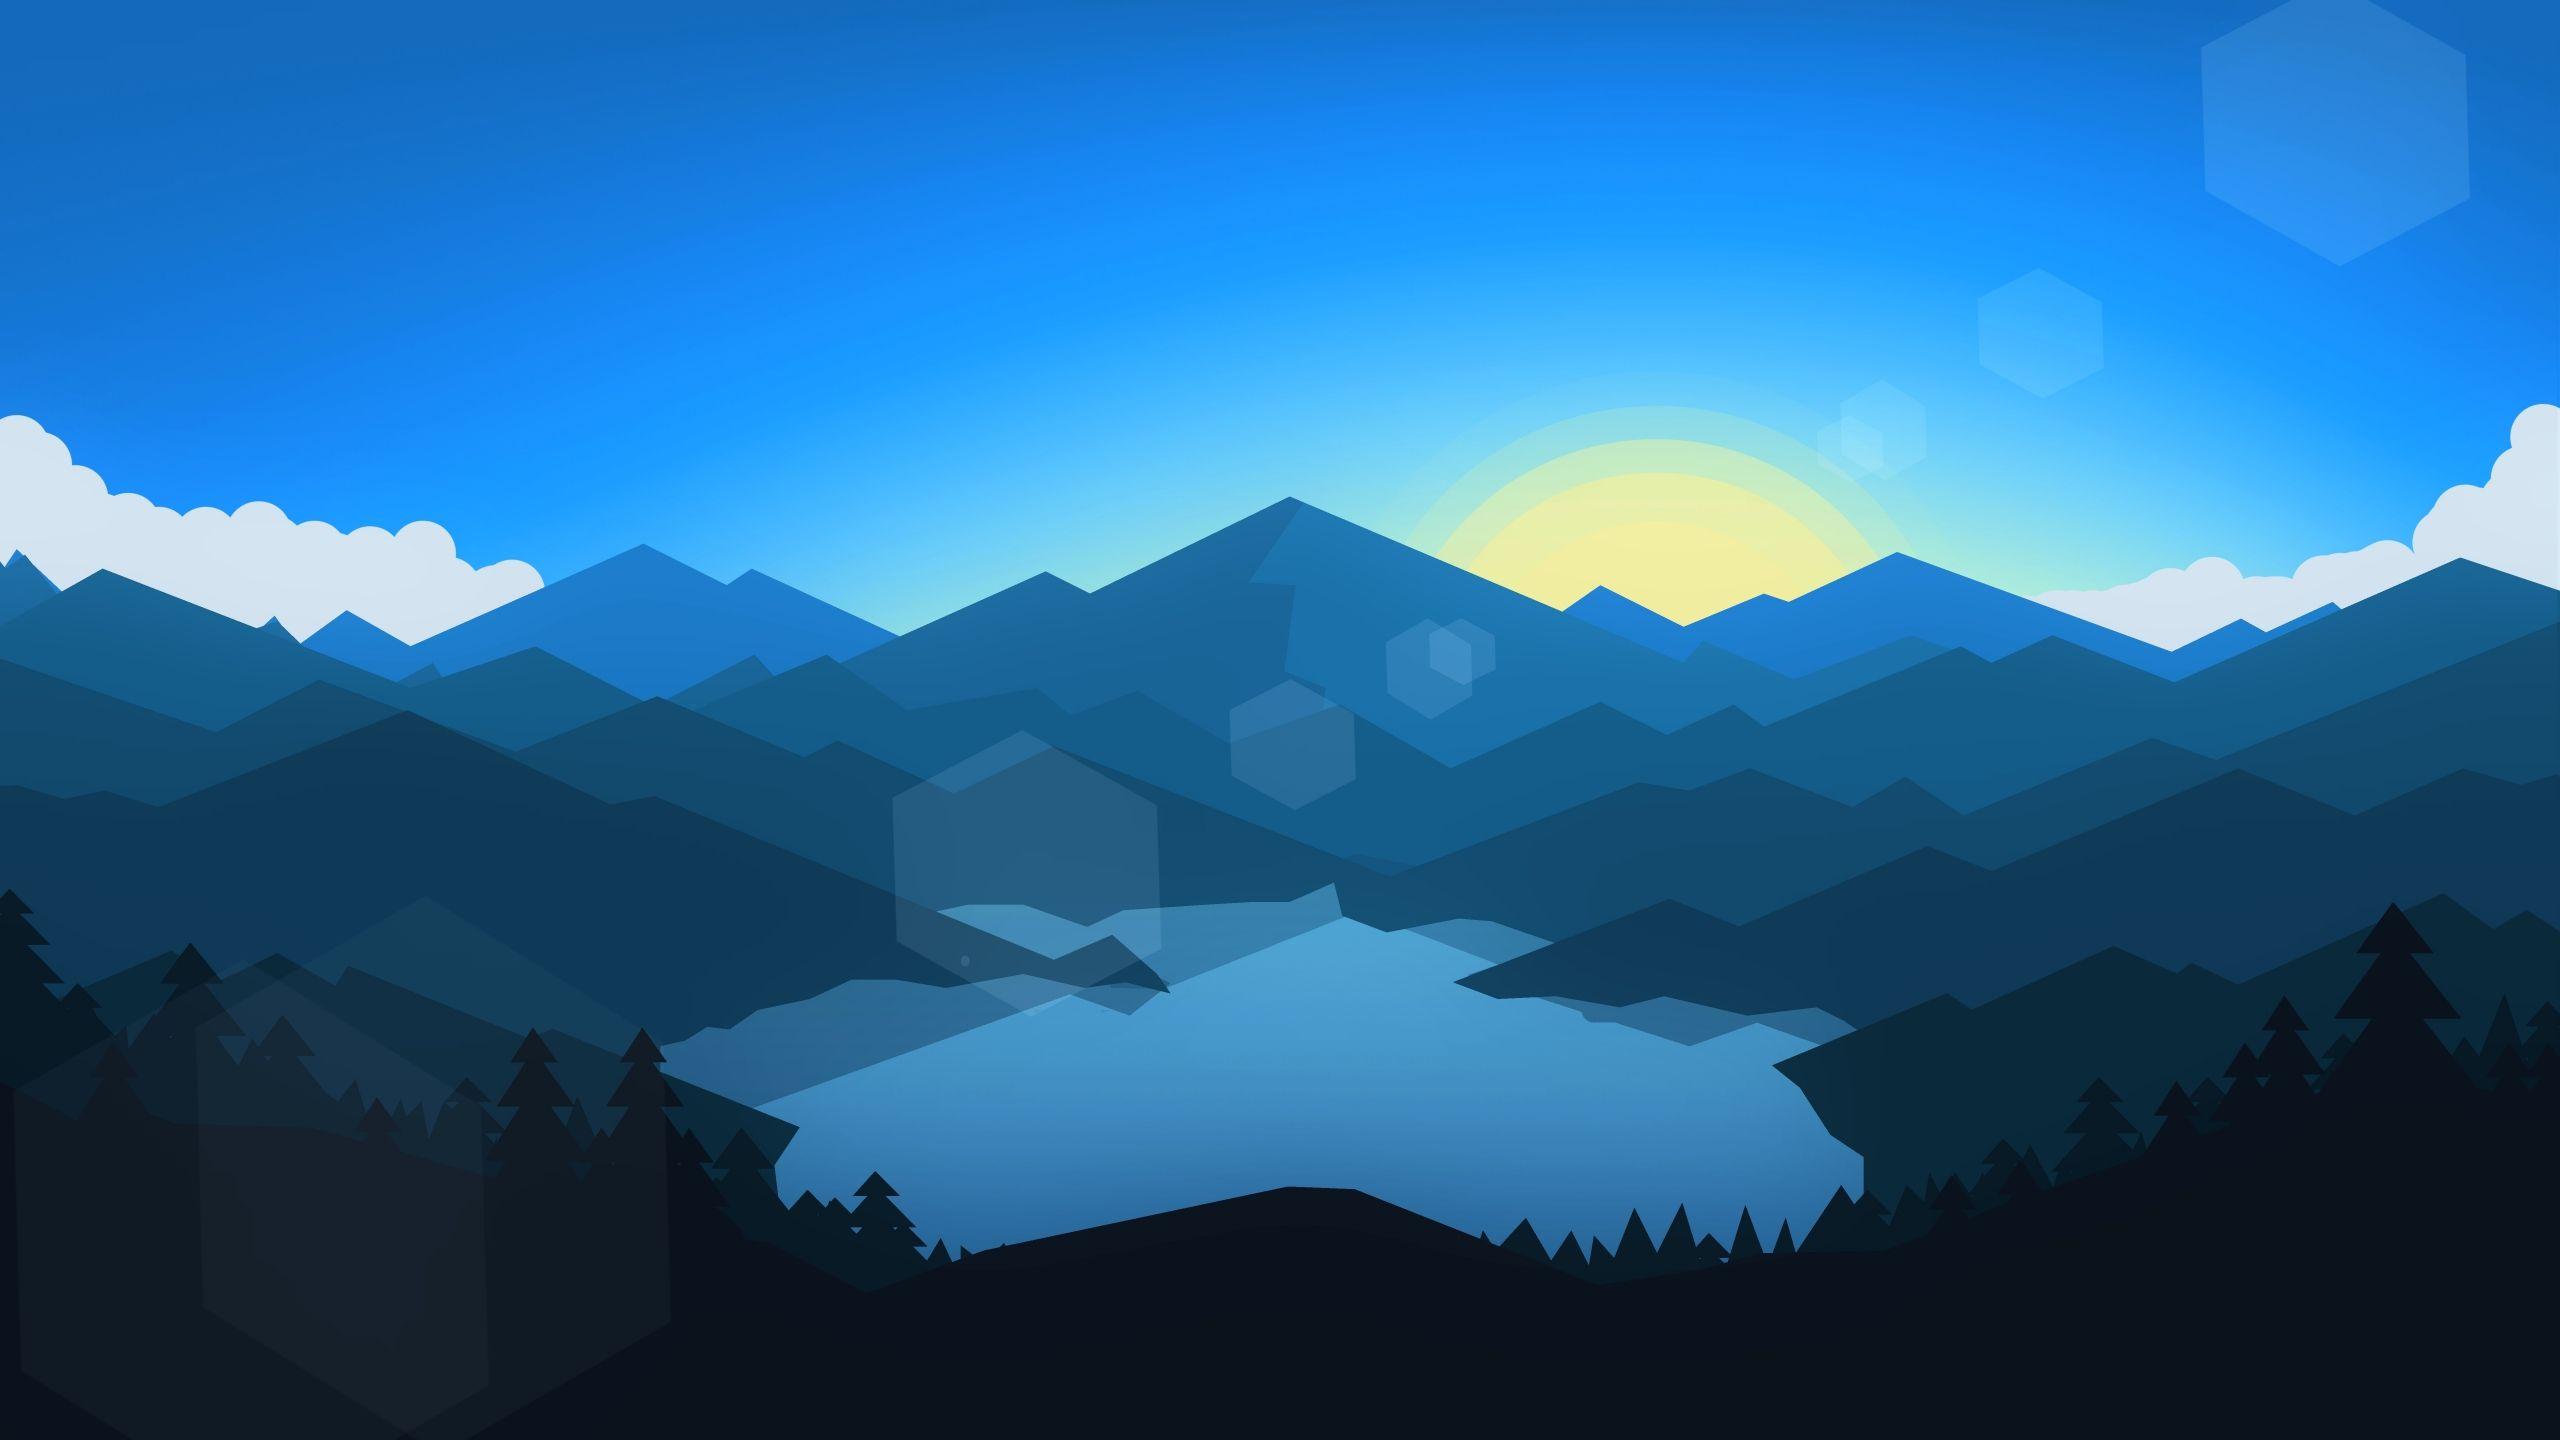 General 2560x1440 Minimalism Abstract Sun Geometry Landscape